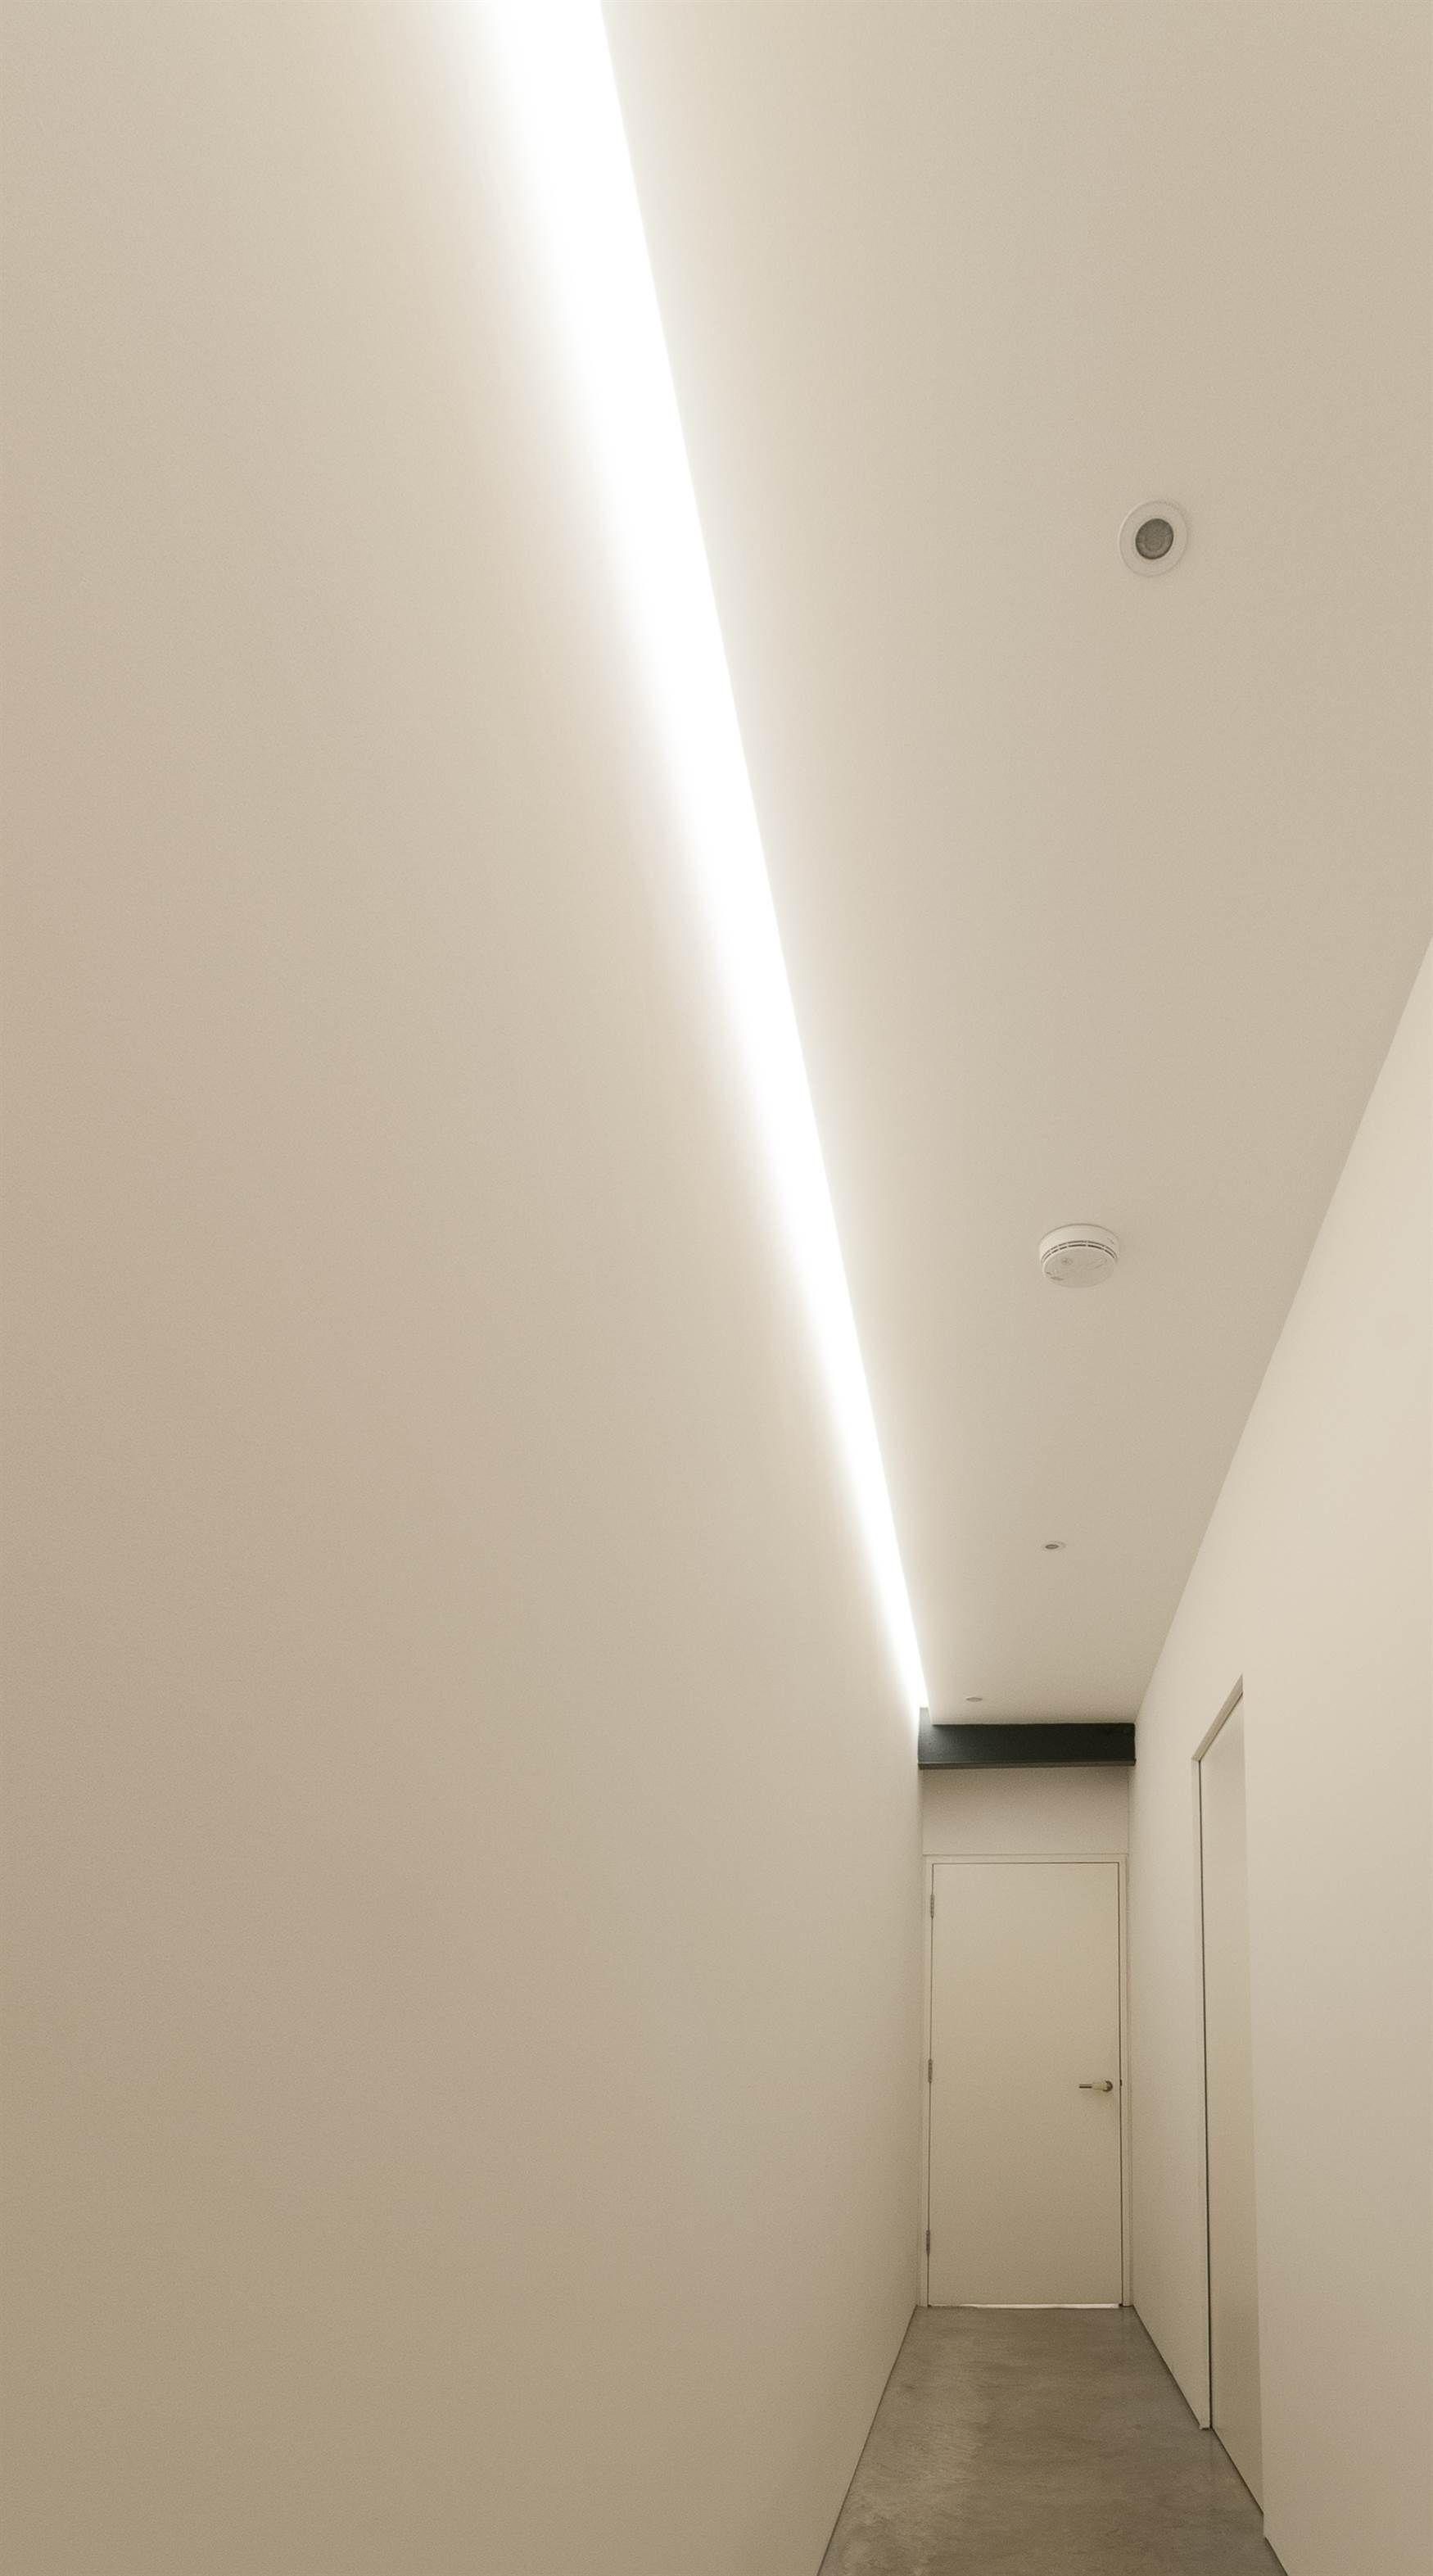 lighting for hallways. lighting design by mr resistor shadow gap led strip in hallway for hallways